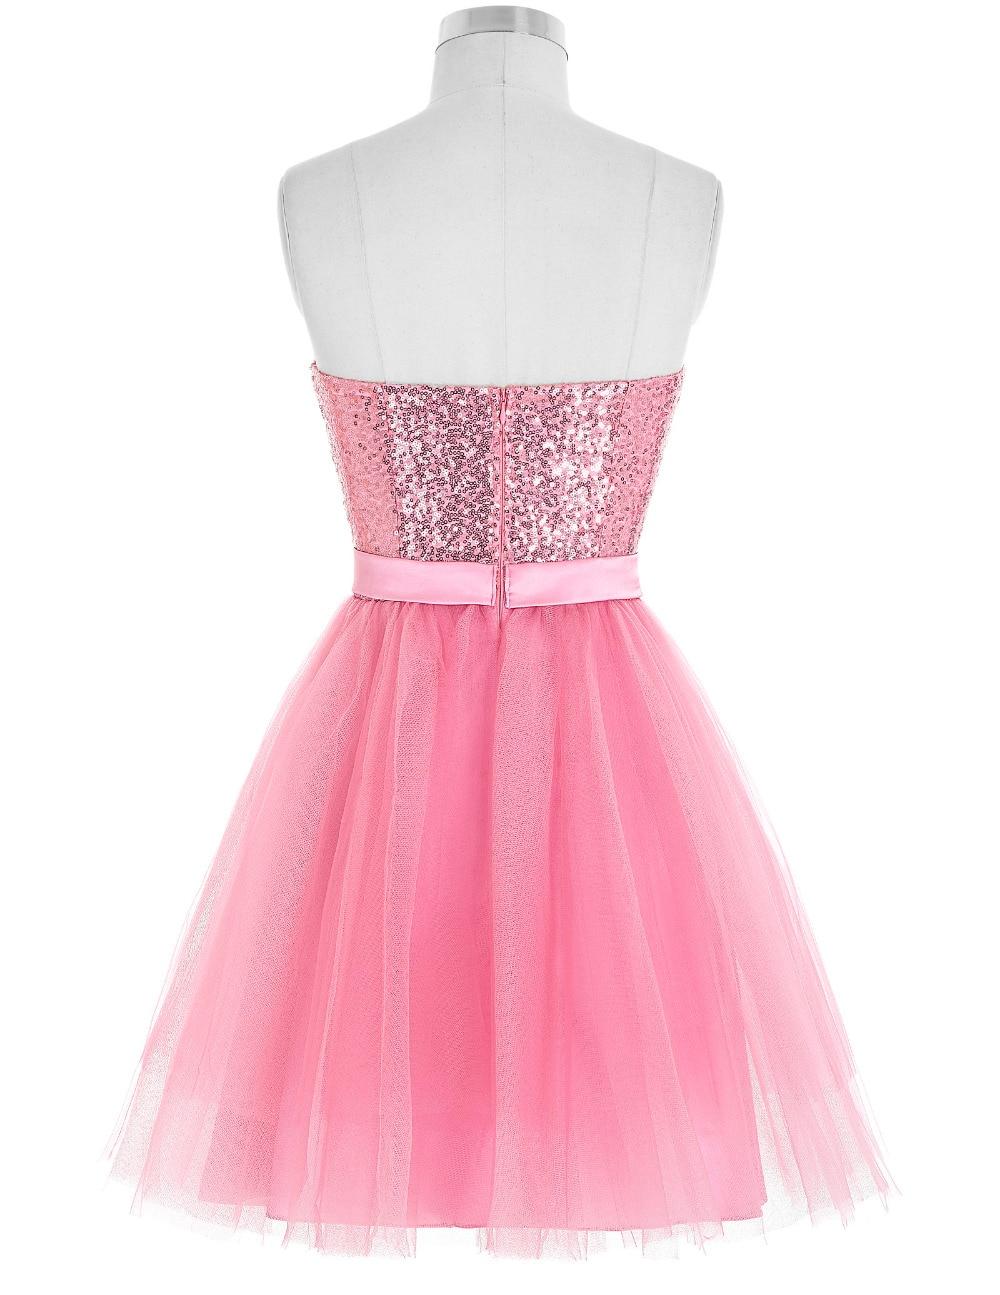 Kate Kasin Short Cocktail Dresses 2017 Sequins Pink Tulle Party ...